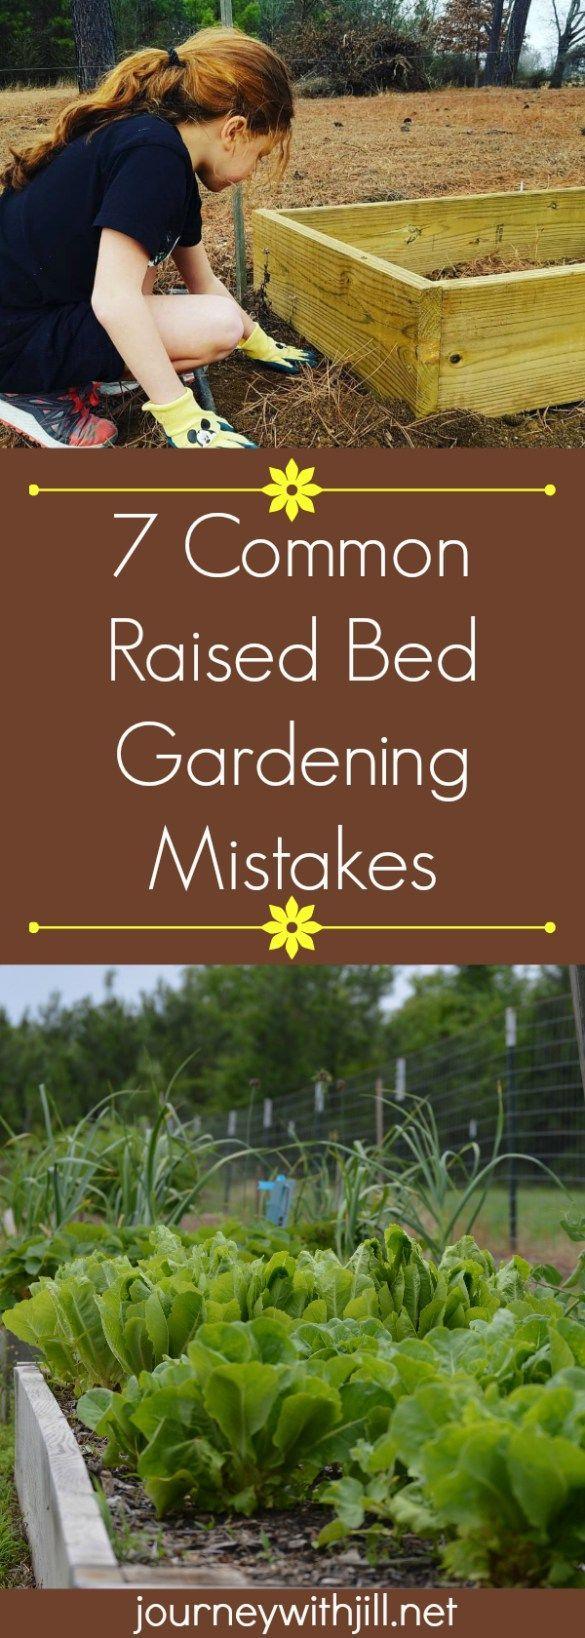 7 Common Raised Bed Gardening Mistakes | gardening | Pinterest ...